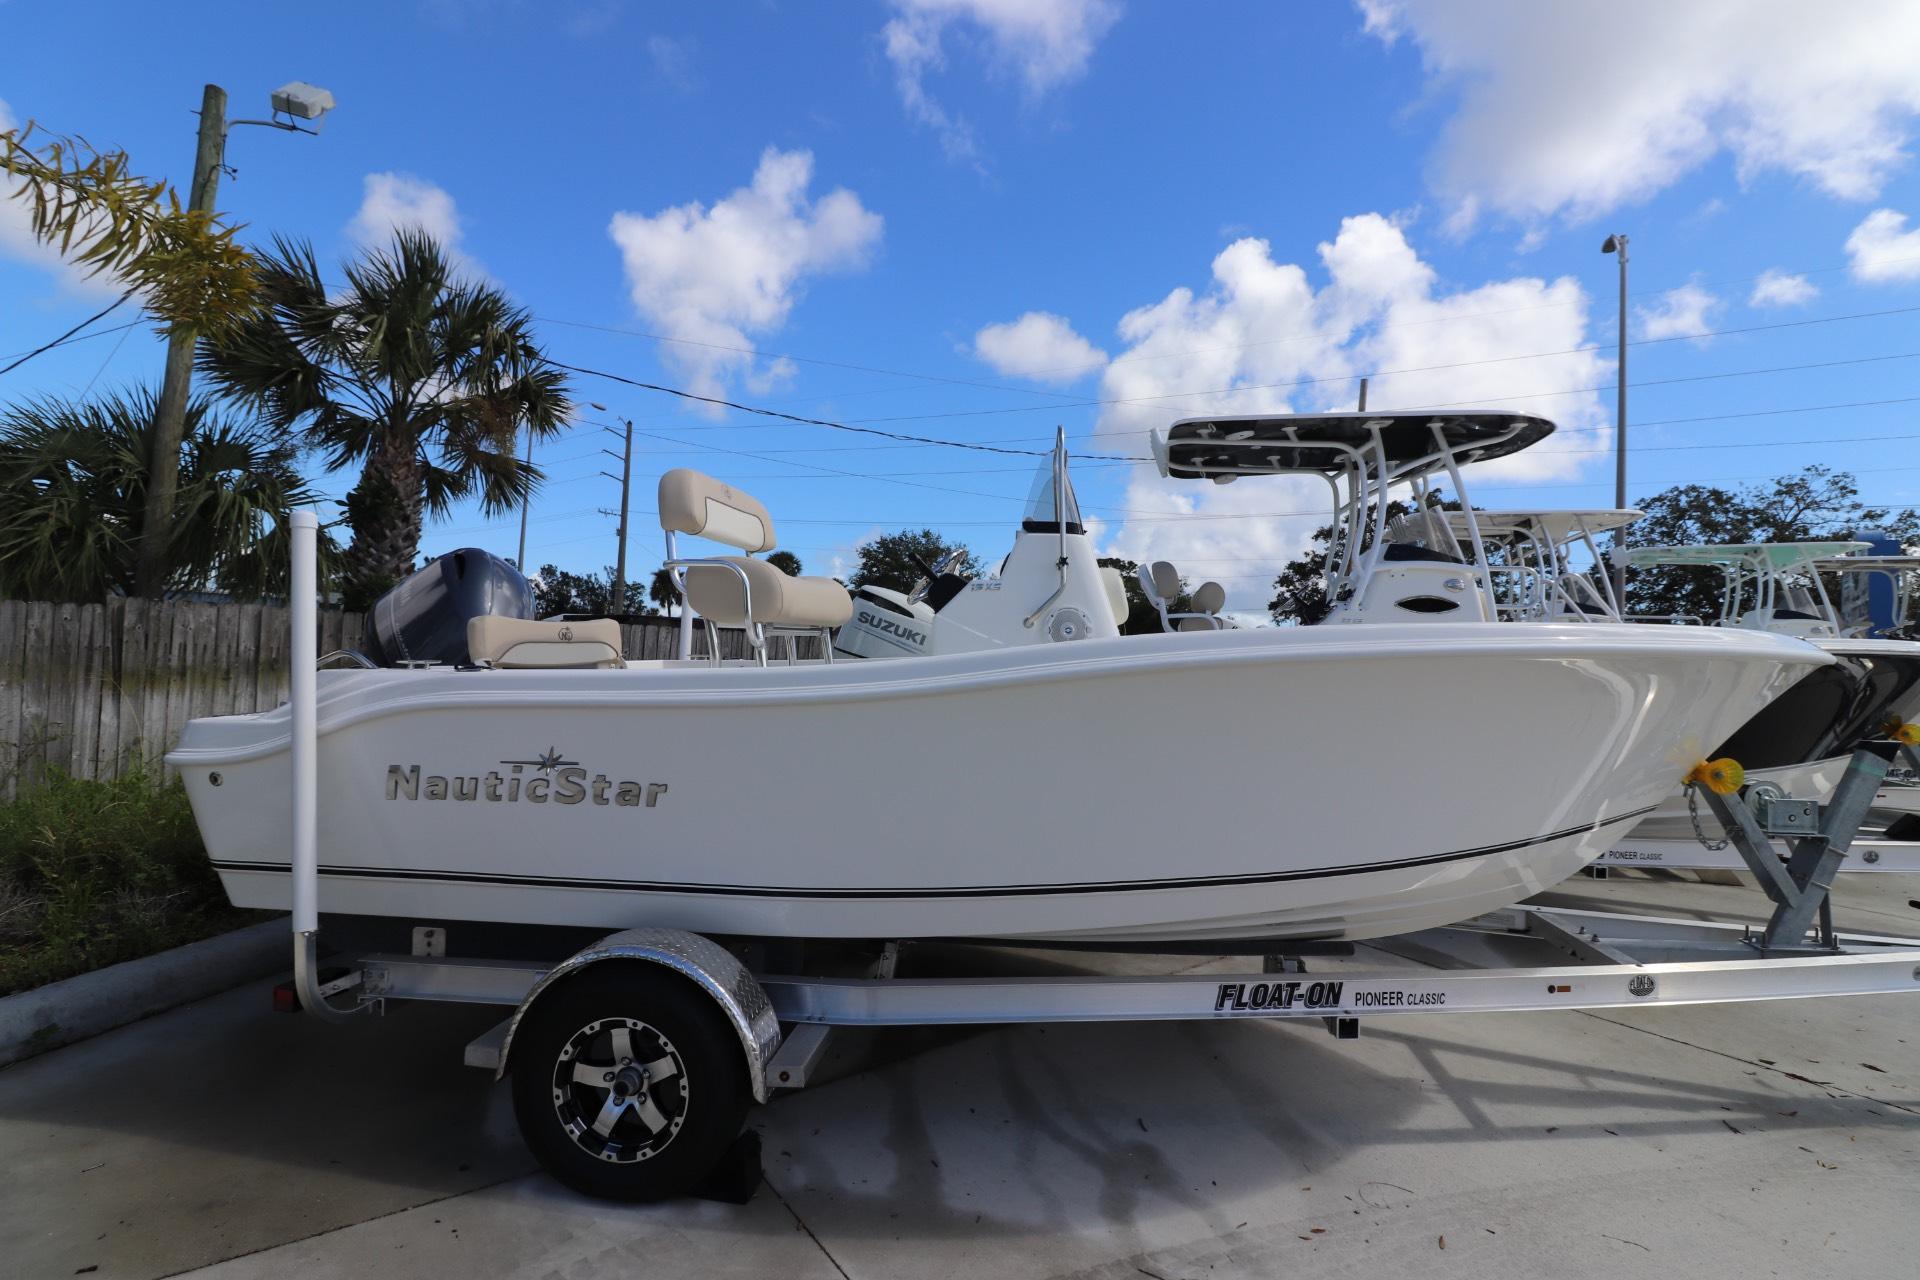 NauticStar 19 XS Offshore